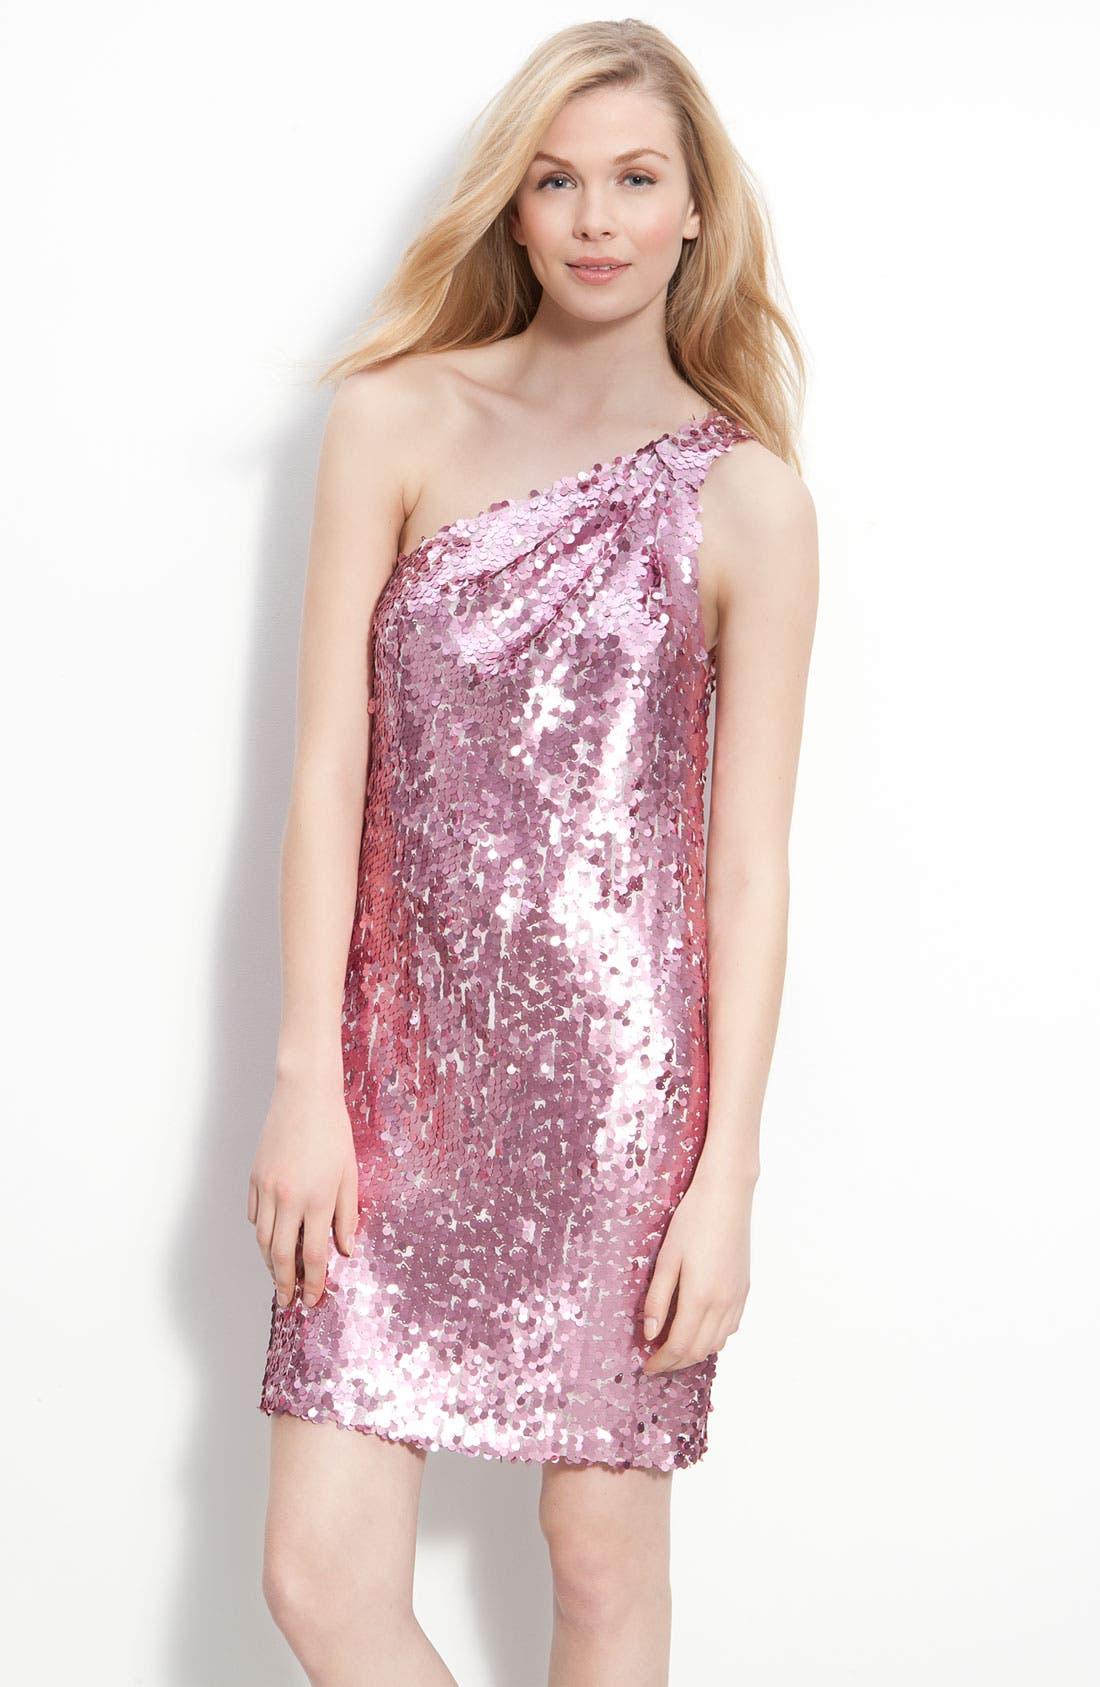 Alternate Image 1 Selected - Alexia Admor One Shoulder Sequin Dress